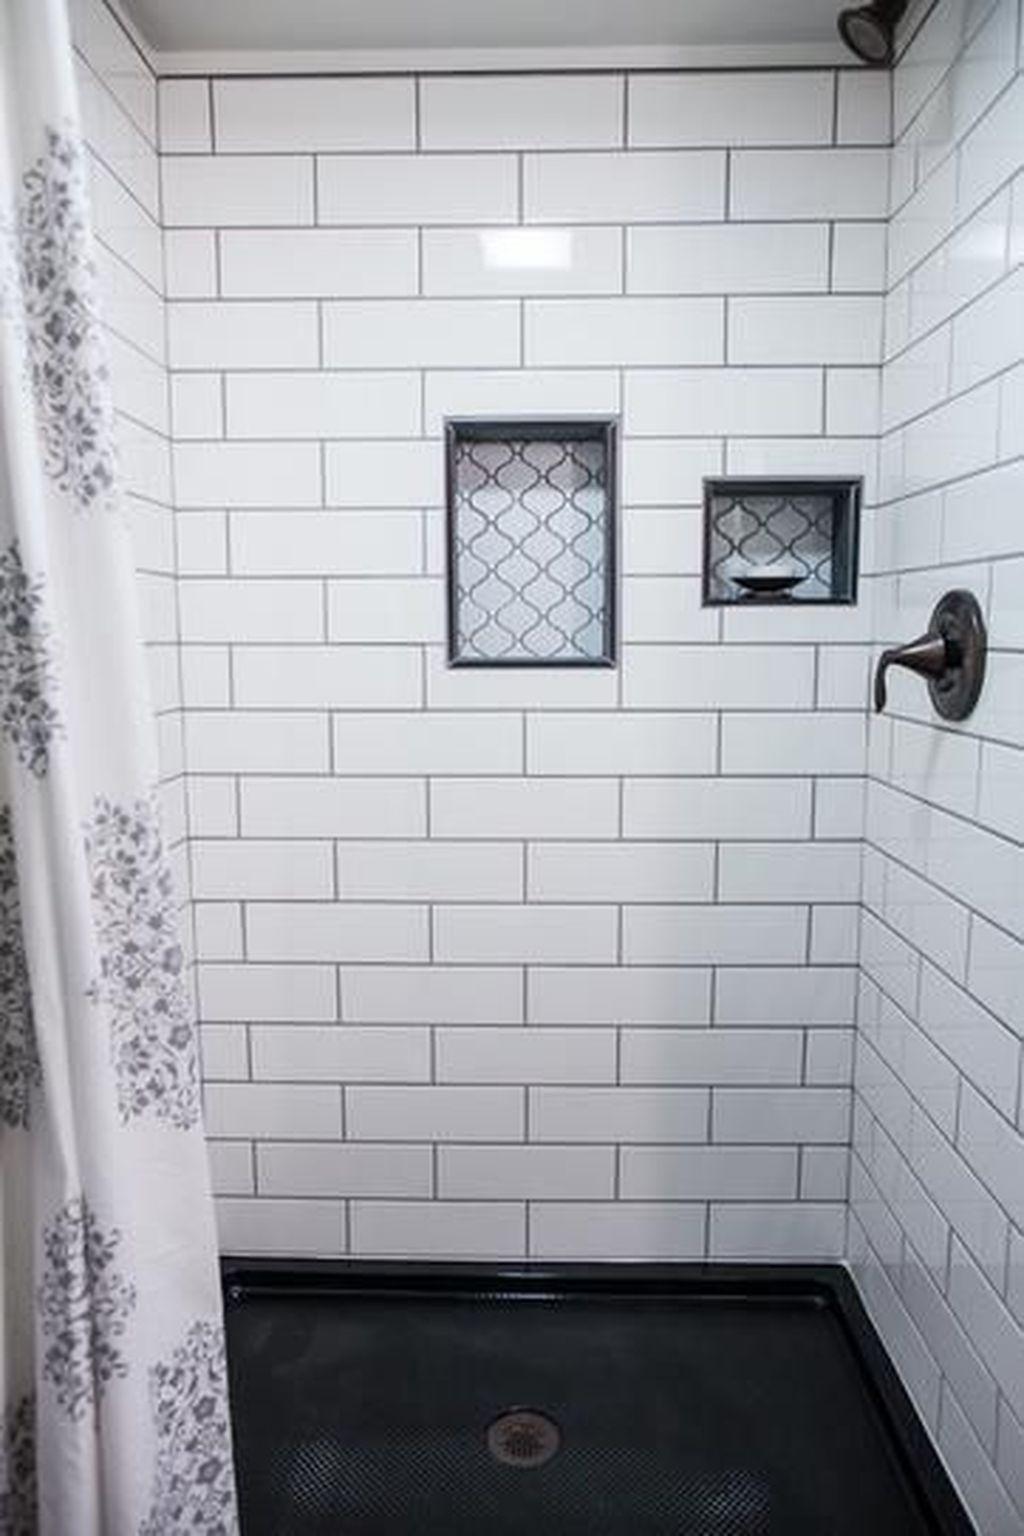 Marvelous Wooden Shower Floor Tiles Designs Ideas For Bathroom Remodel 14